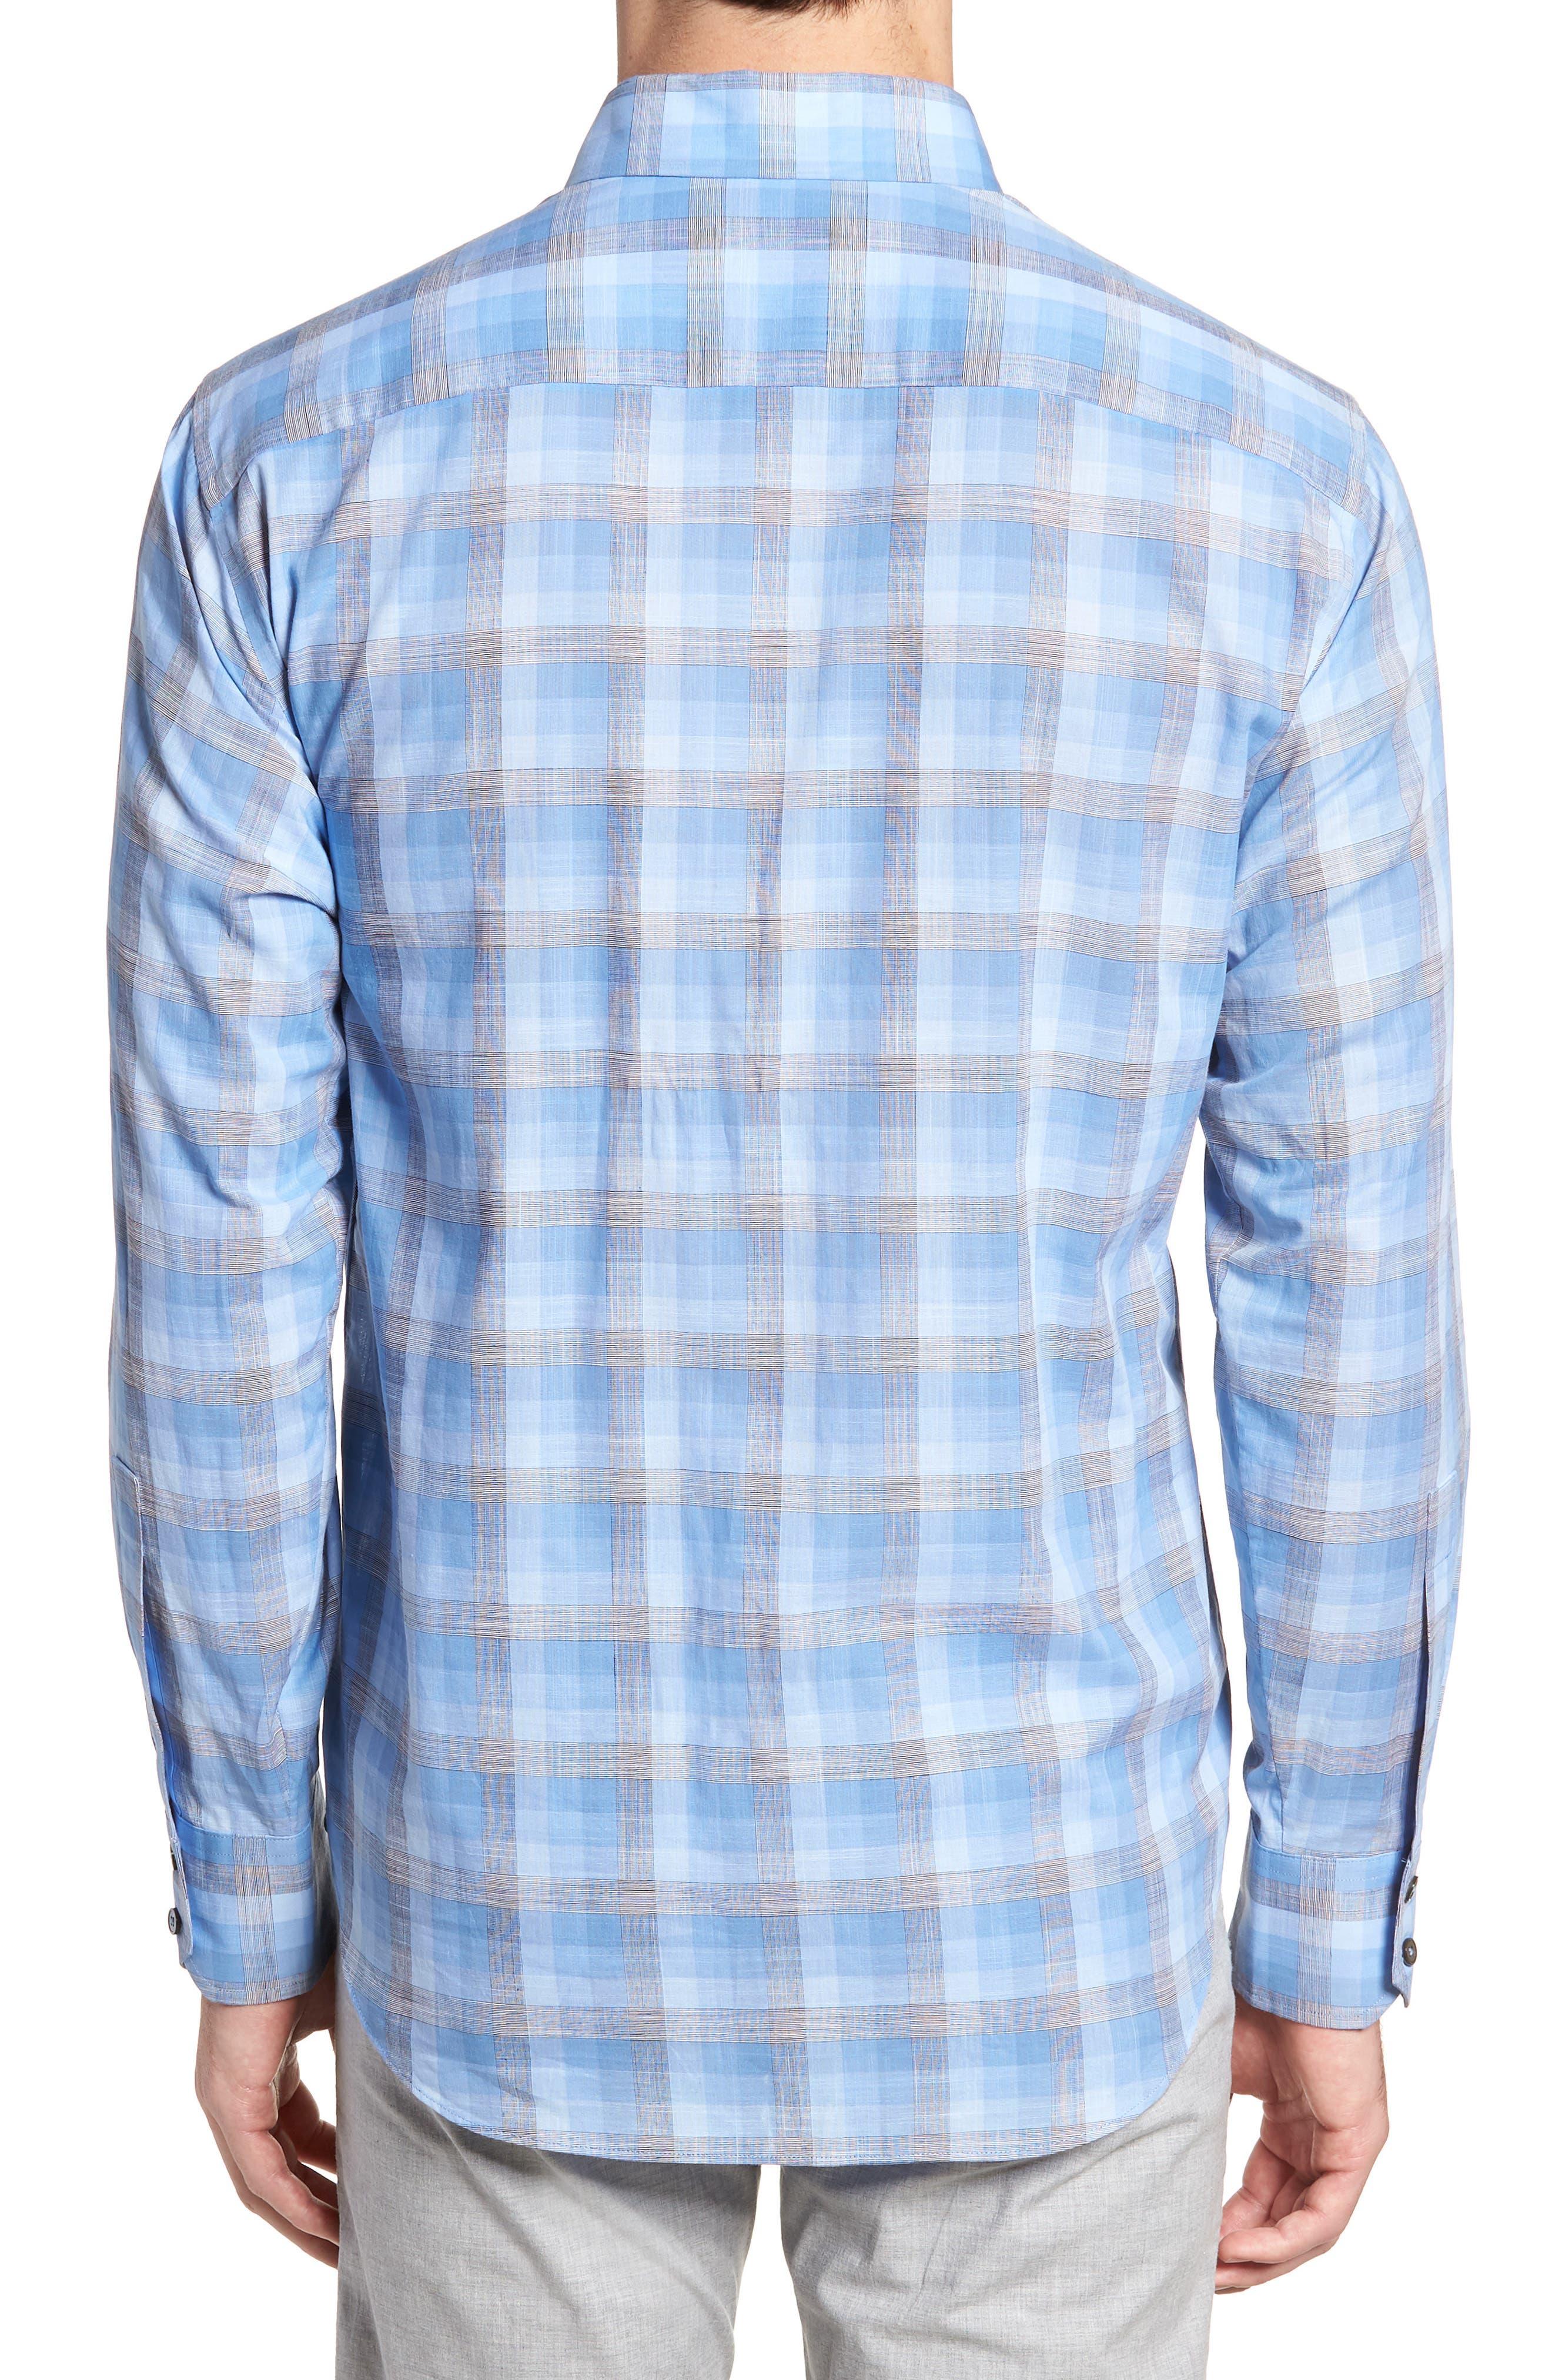 Asim Regular Fit Sport Shirt,                             Alternate thumbnail 2, color,                             422